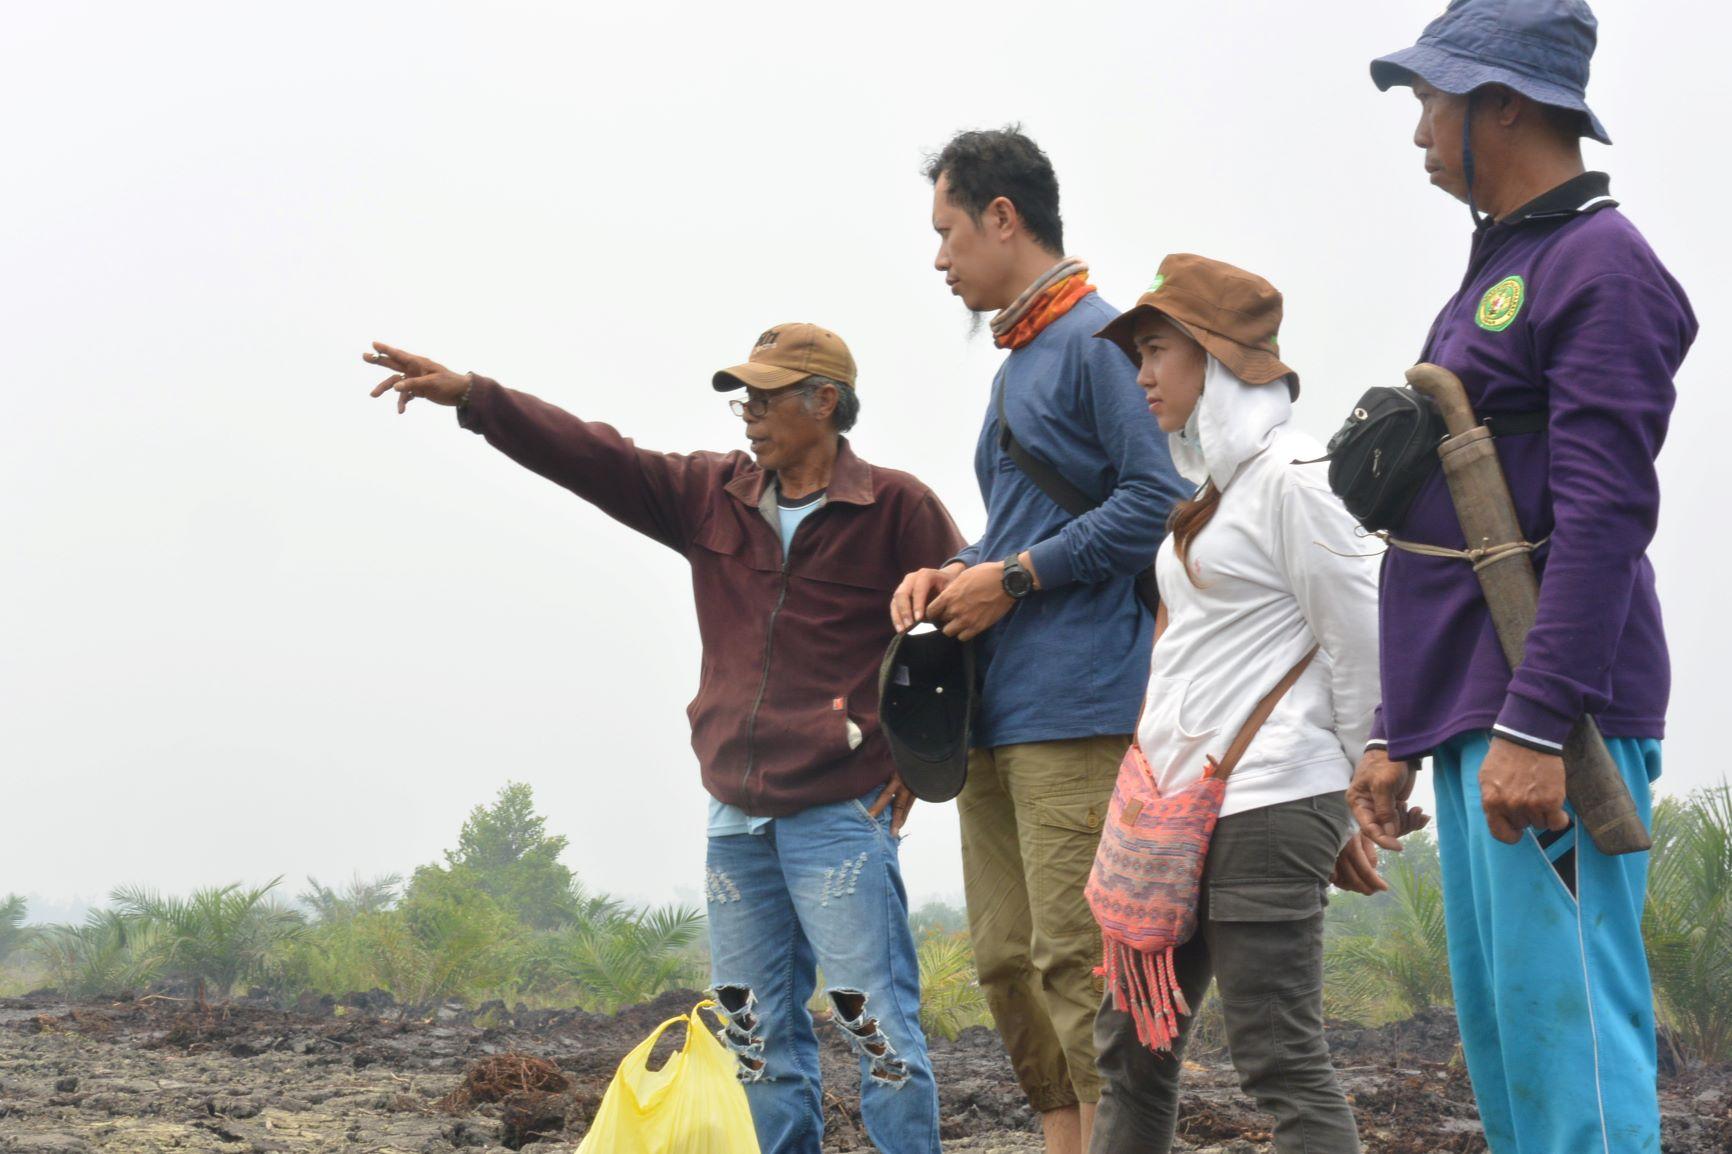 Foto KPSHK. Batas Kanal dan Sekat Bakar Perusahaan di Desa Kalumpang (Sept'18).